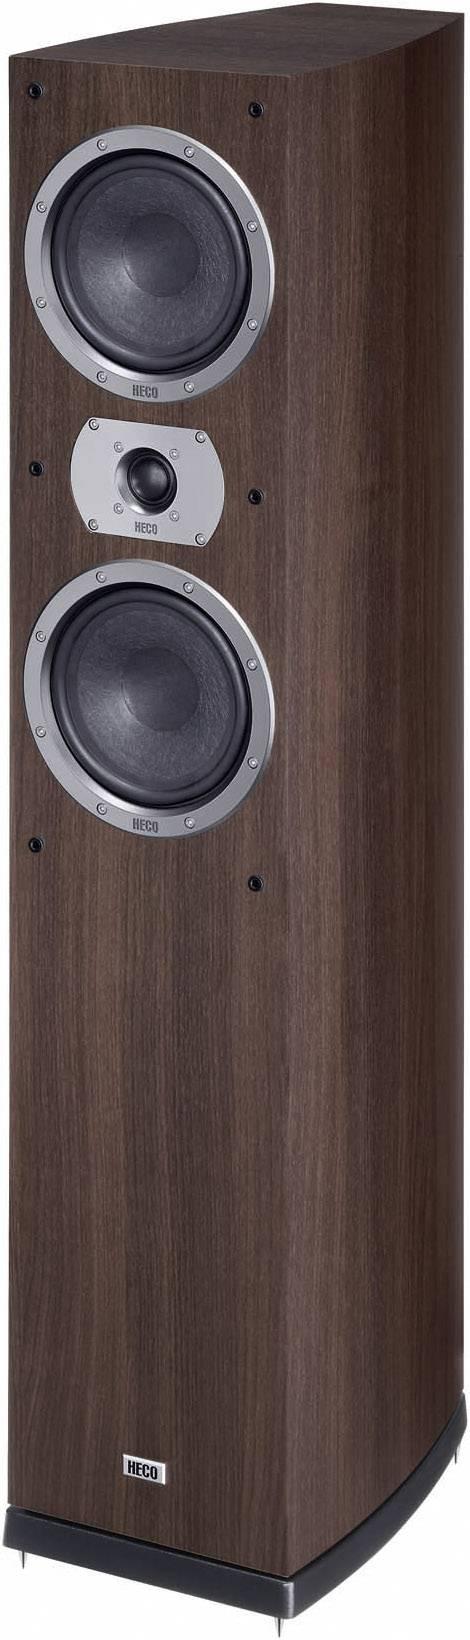 Stĺpový reproduktor HECO Victa Prime 502, 35 do 40000 Hz, 265 W, 1 ks, espresso